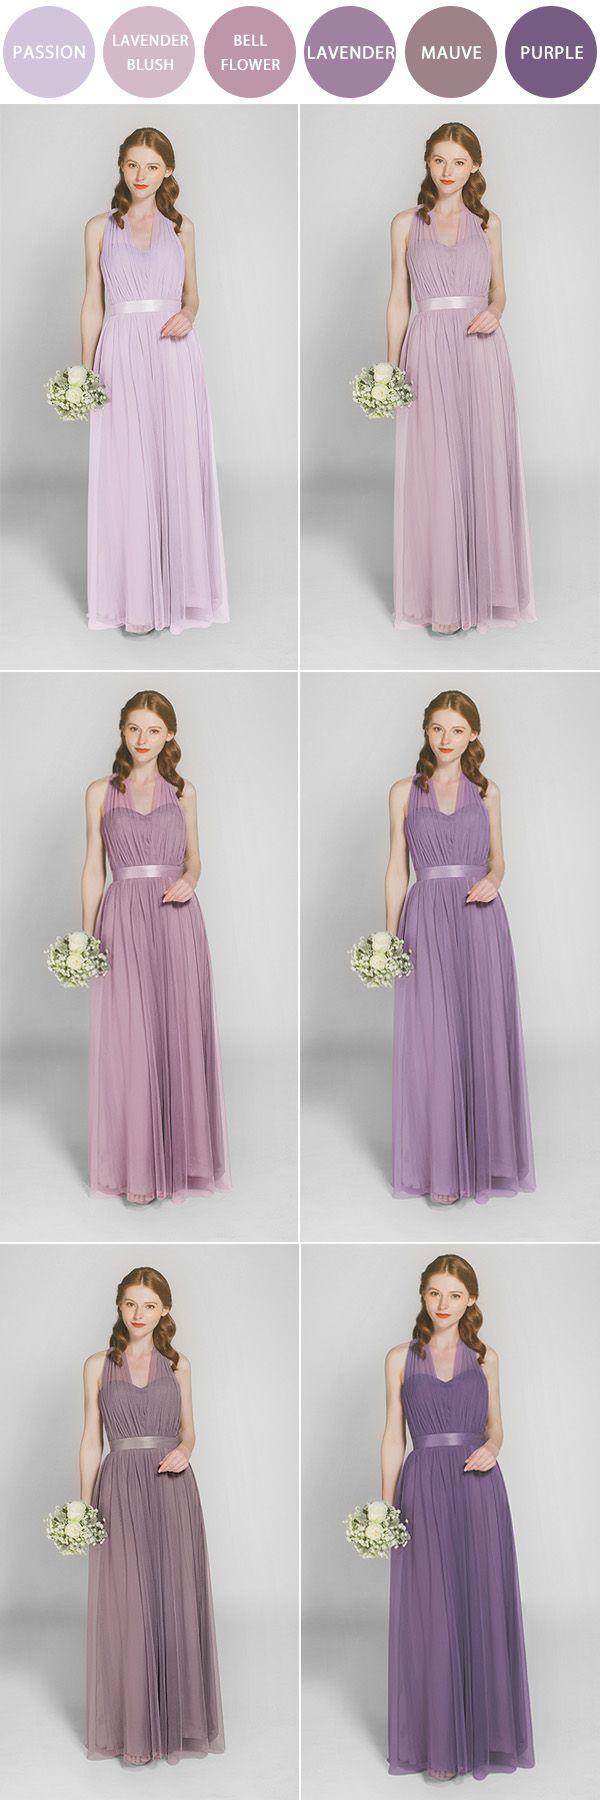 shades of purple bridesmaid dresses